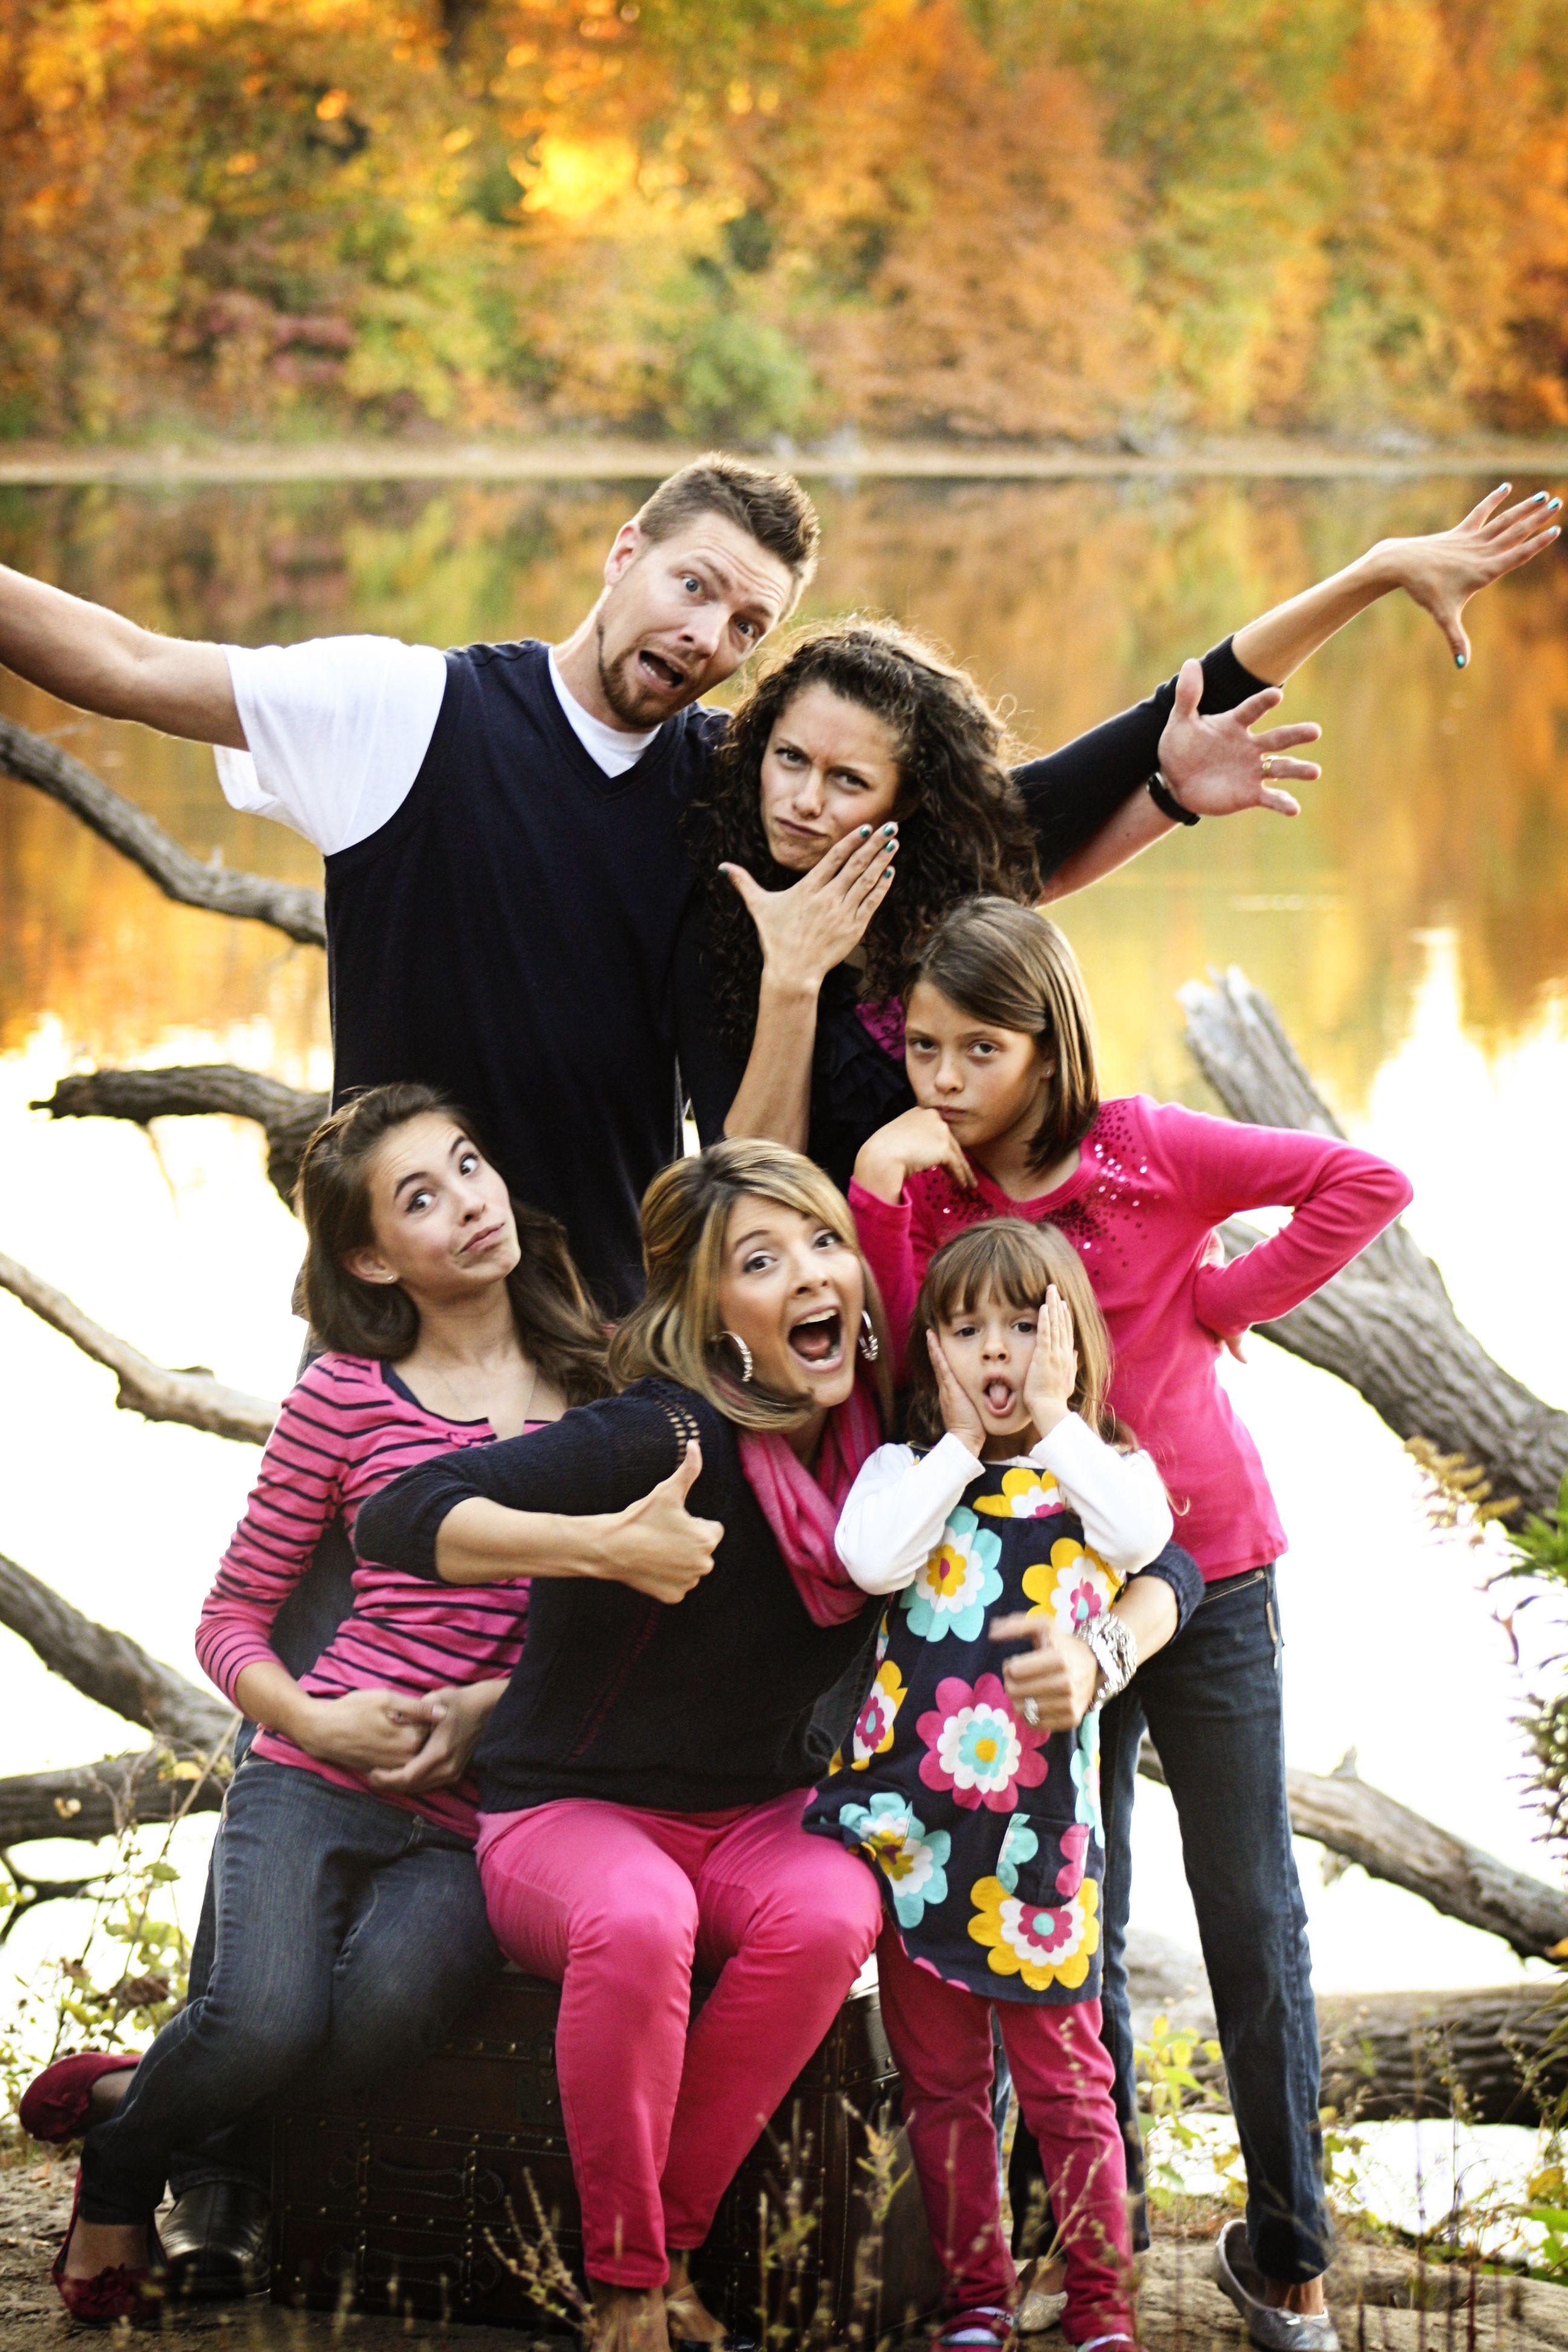 Funny Group Photo Pose Ideas : funny, group, photo, ideas, Family, Photos, Photos,